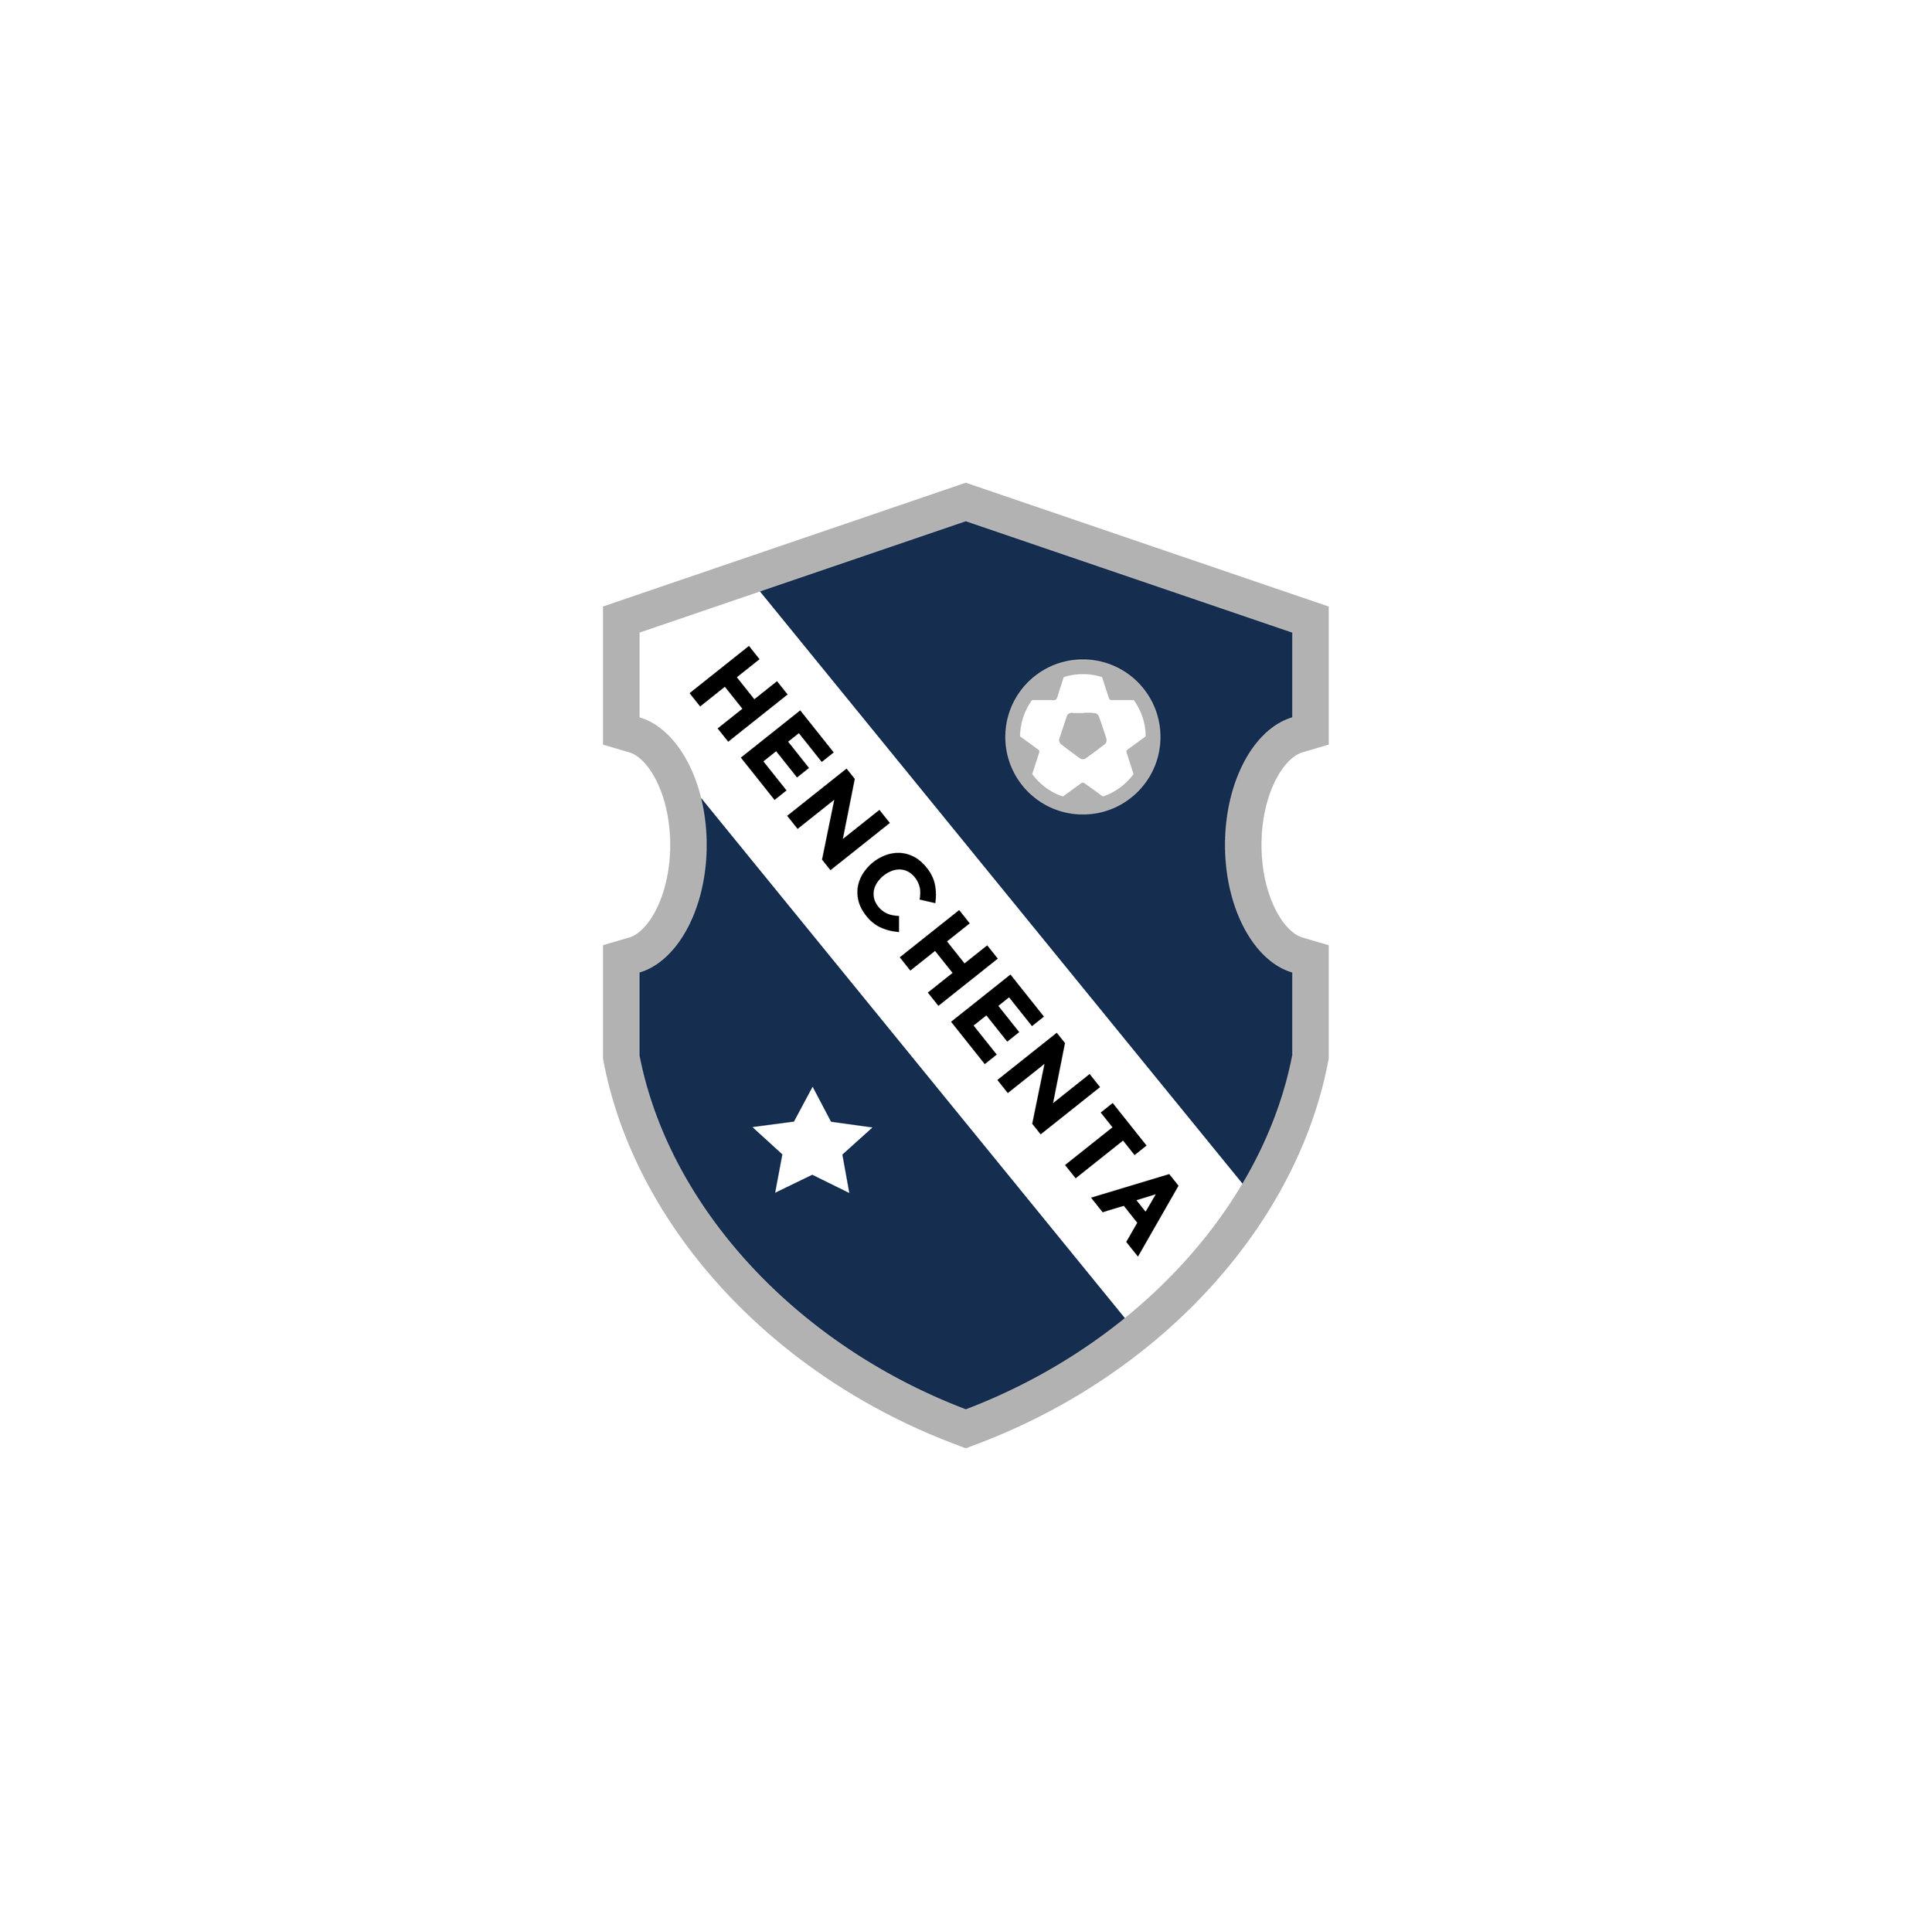 GMSA Crest Redesign-22.jpg